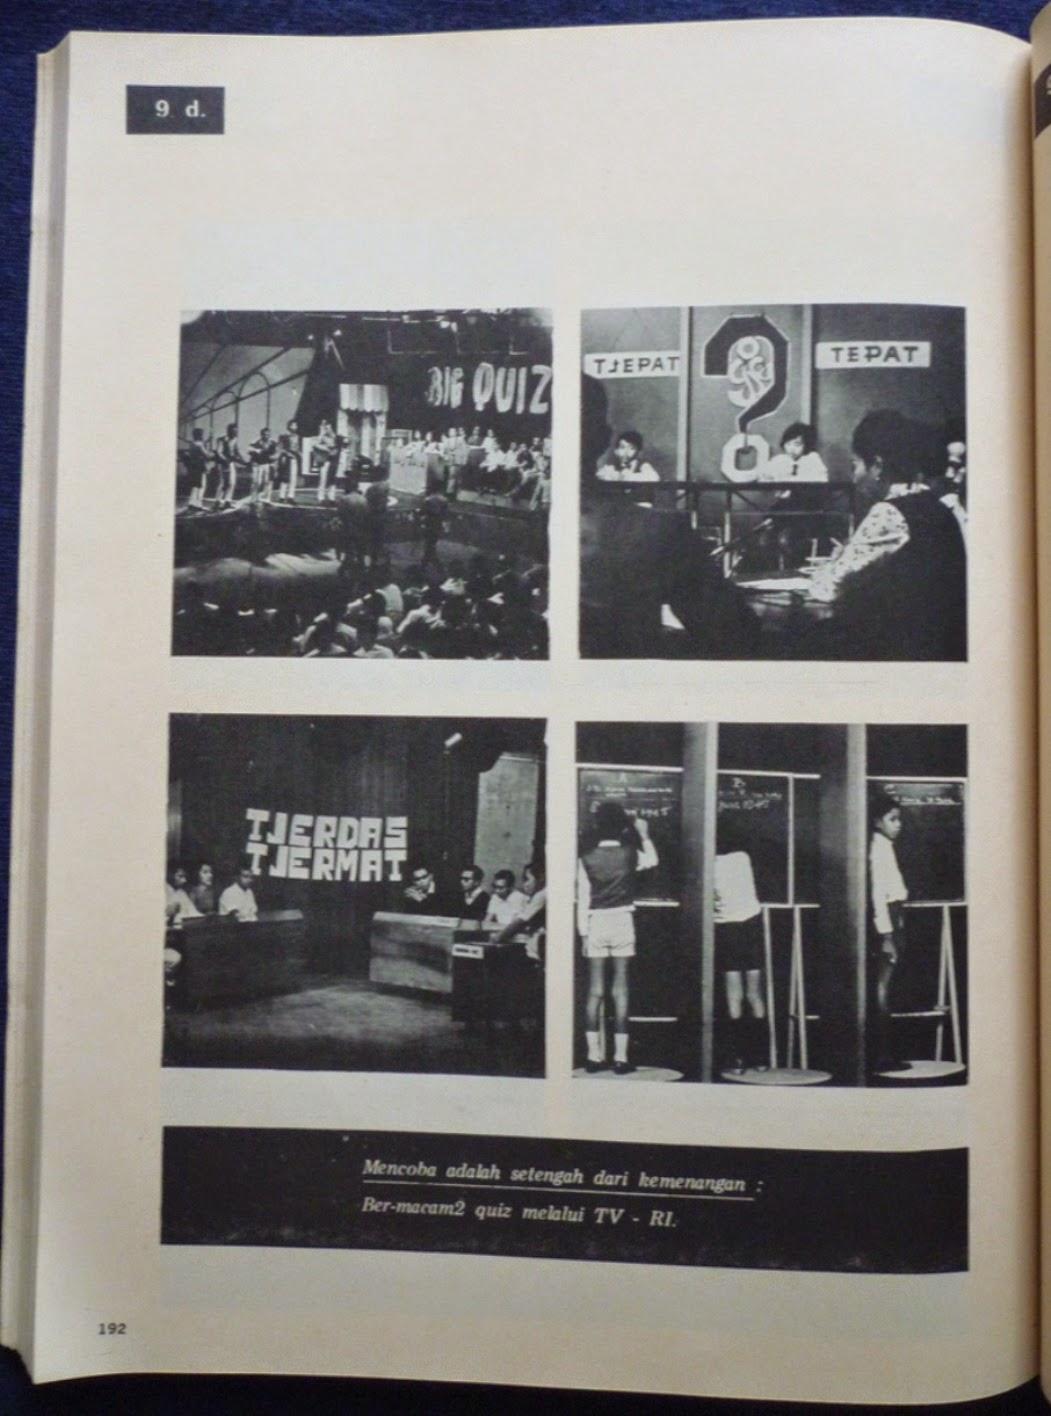 Koleksi Tempo Doeloe: Televisi di Indonesia TVRI 1962-1972